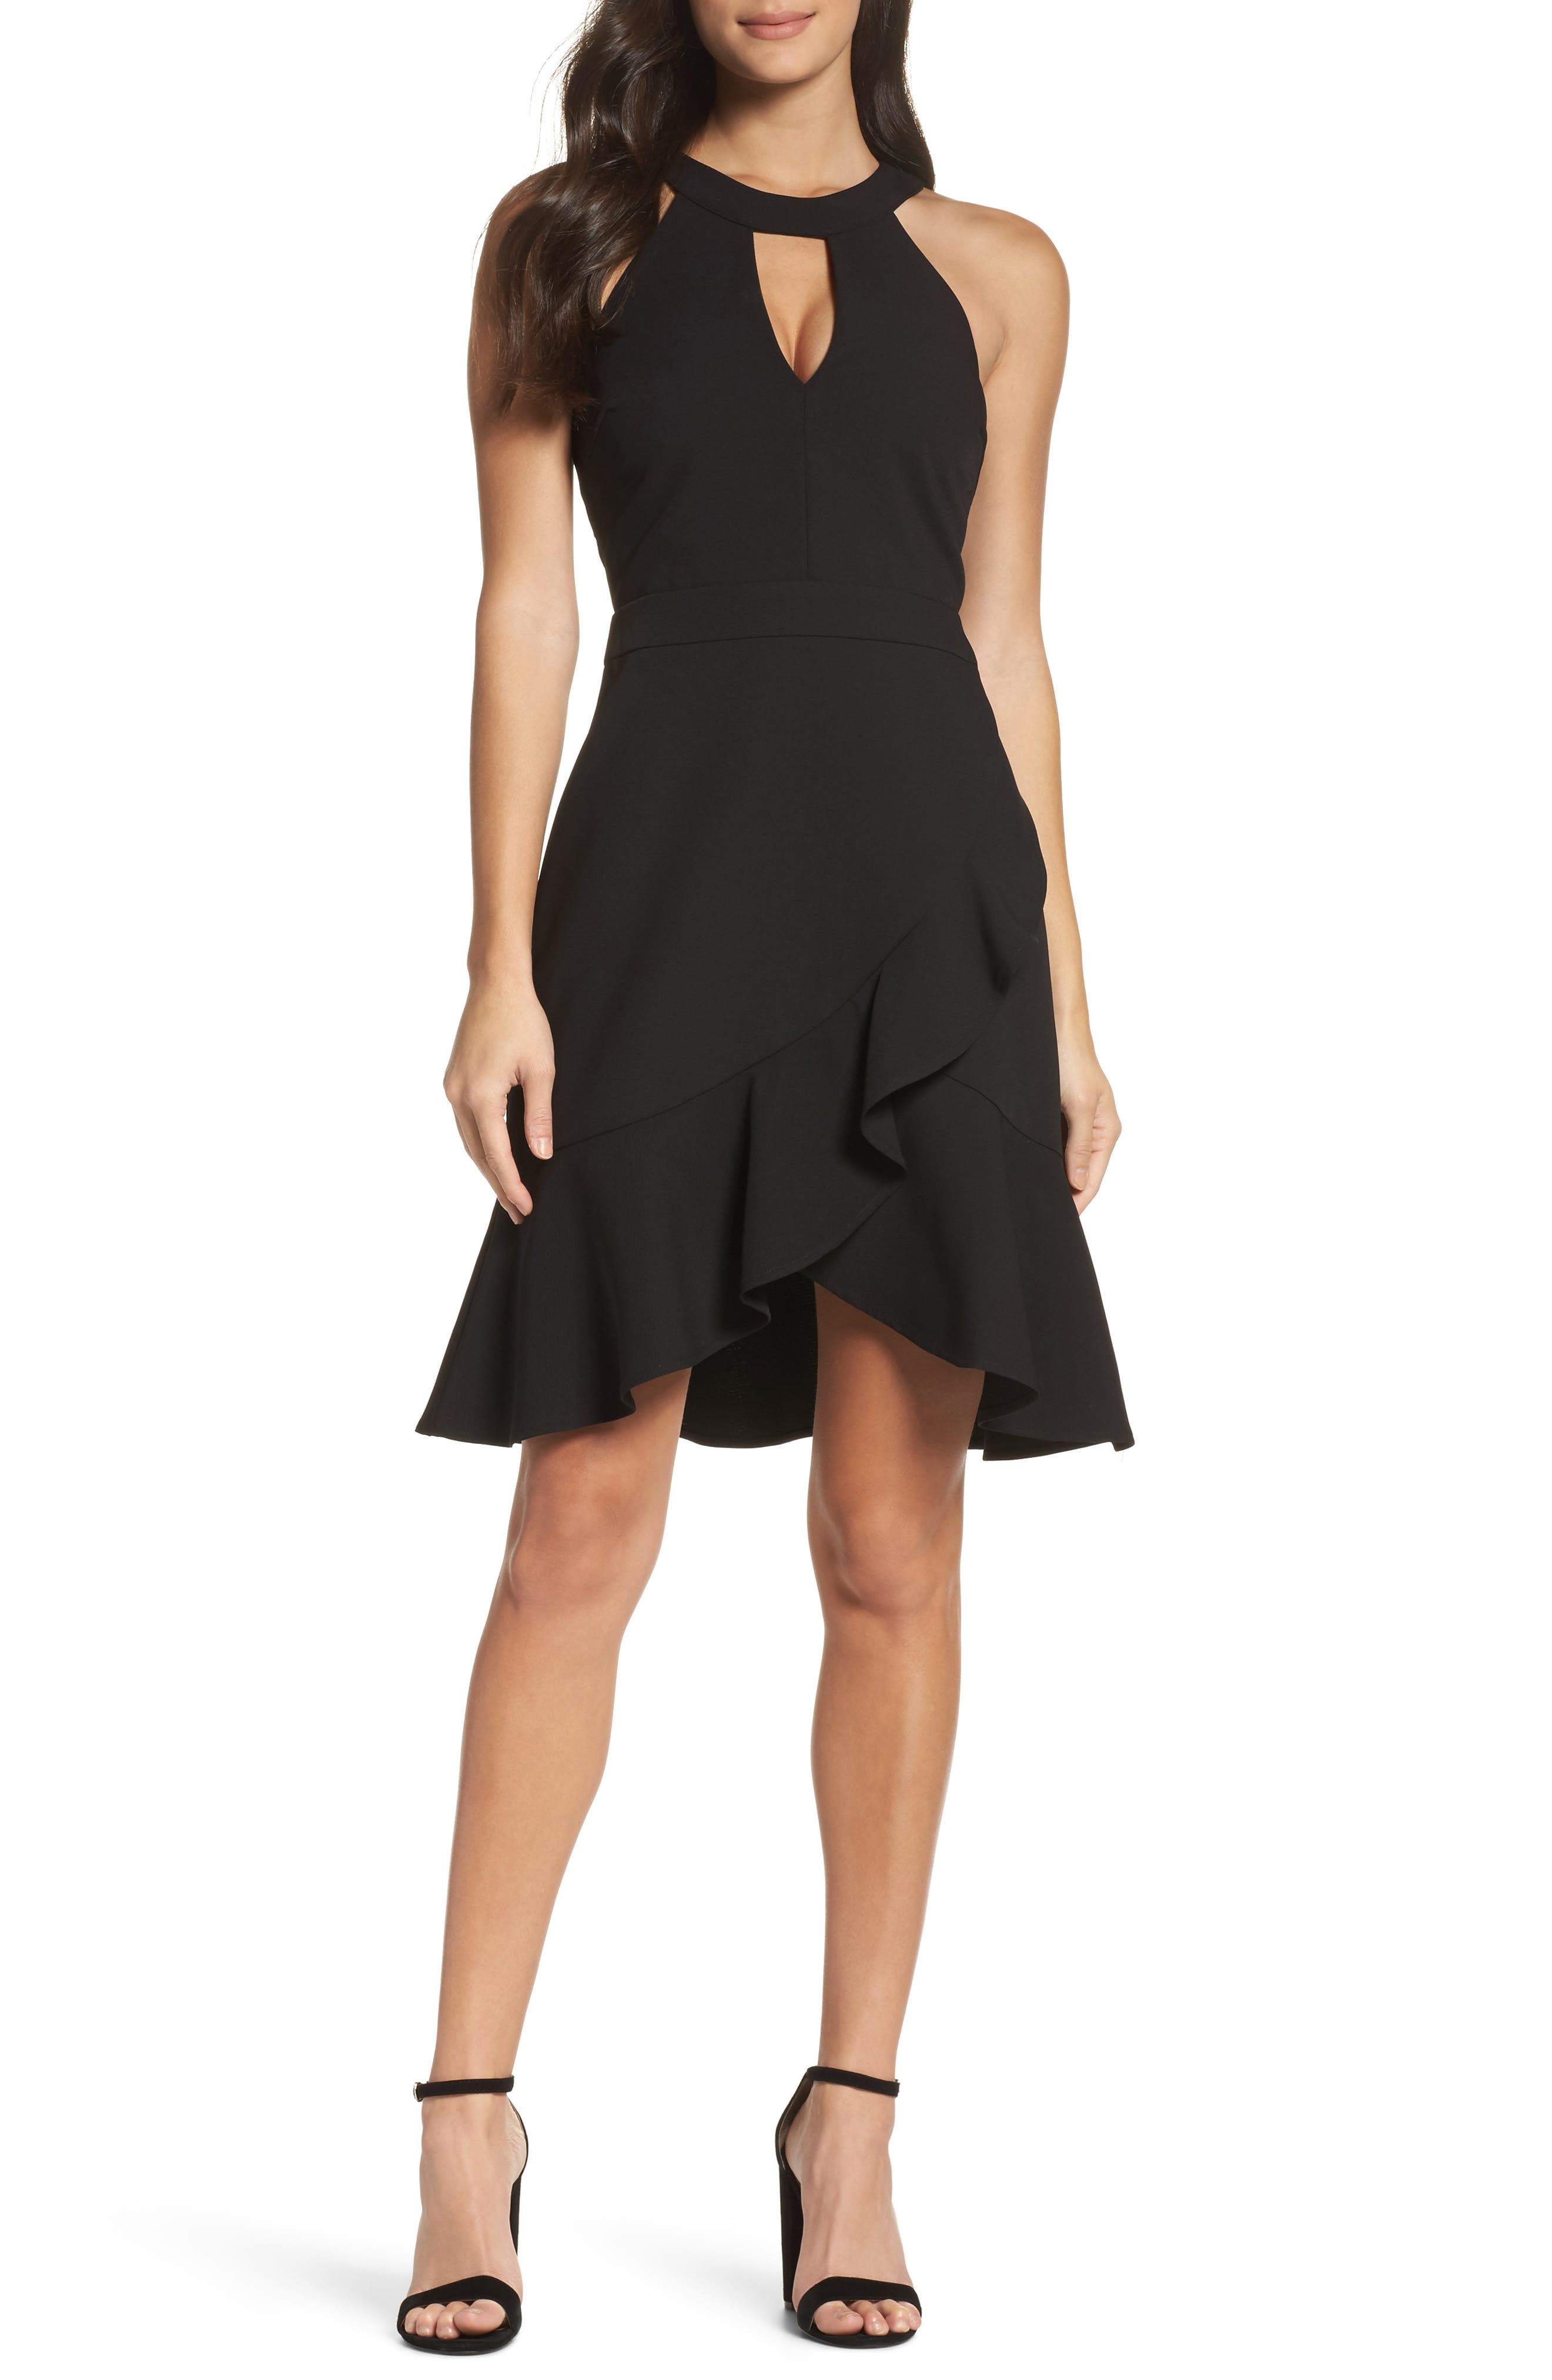 Alternate Image 1 Selected - Adelyn Rae Kasi Ruffle Fit & Flare Dress